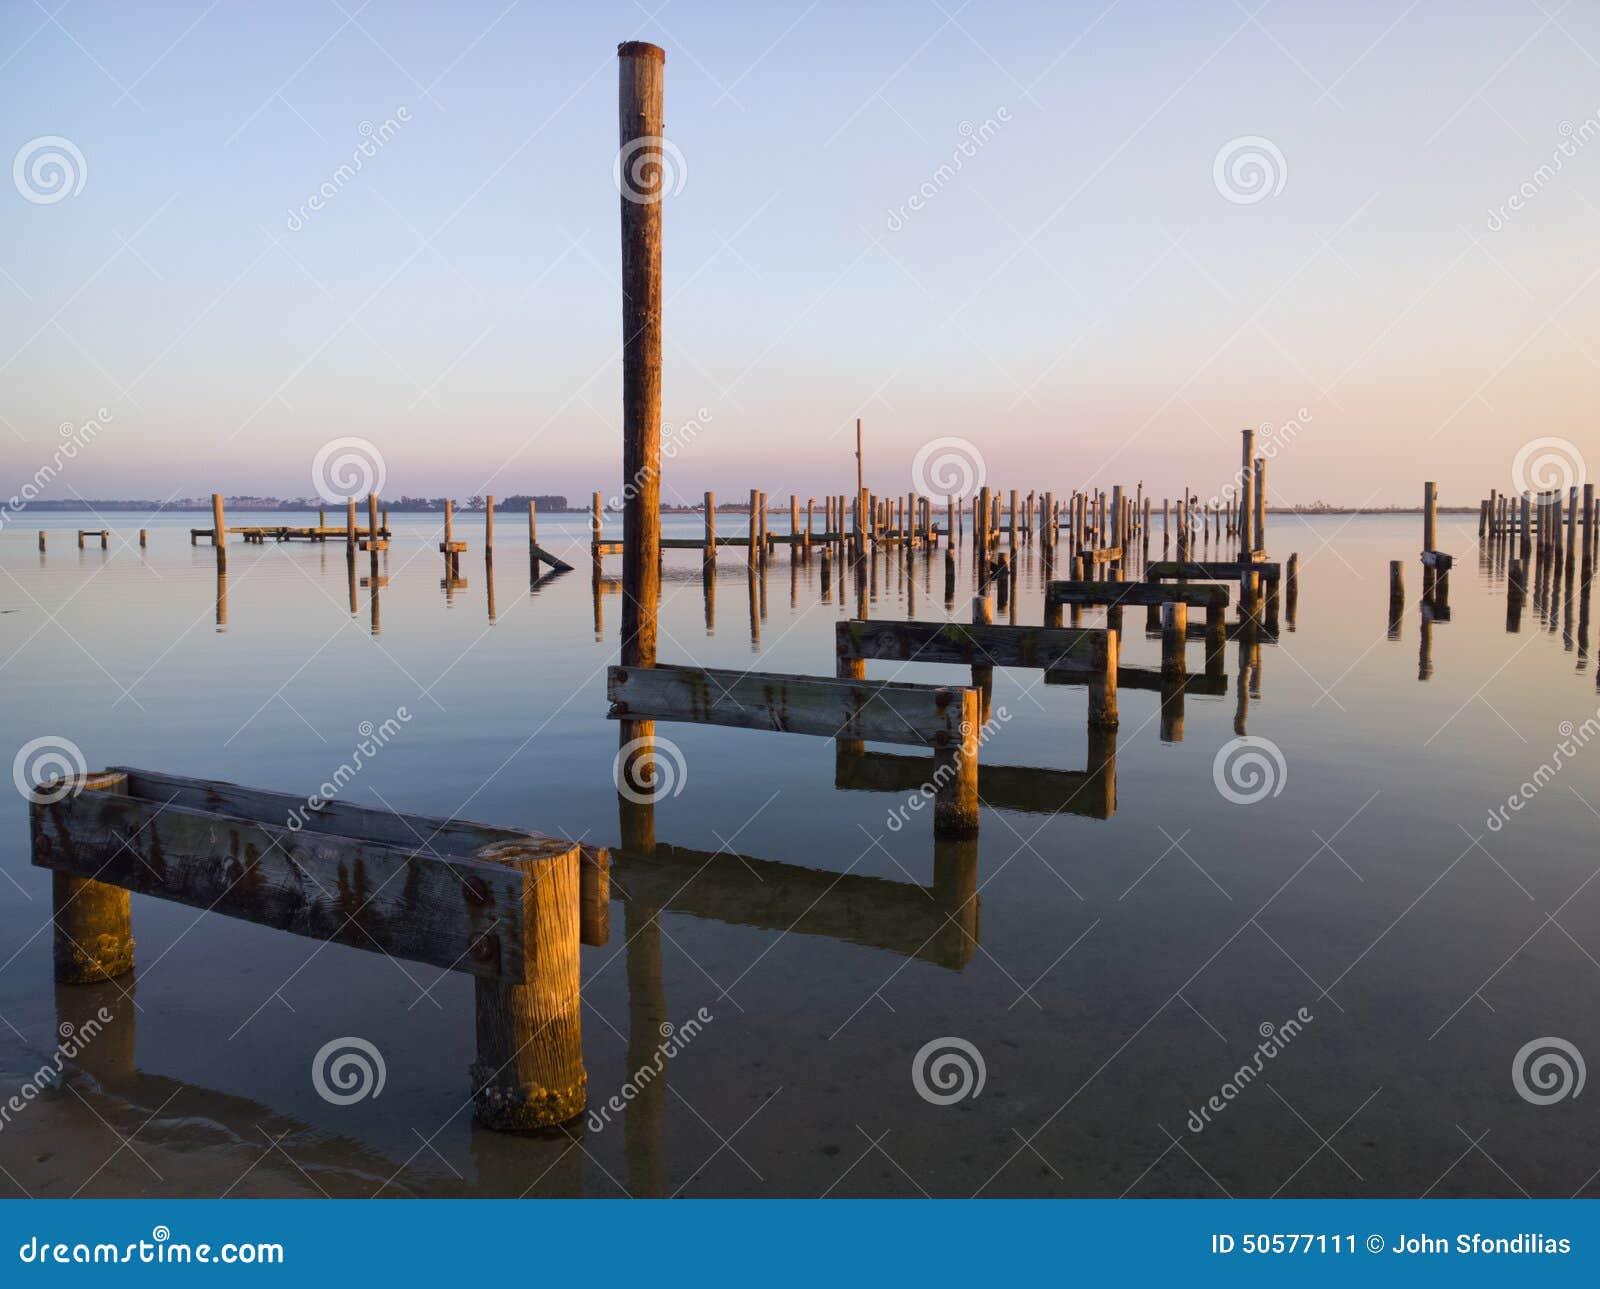 Missing Piers